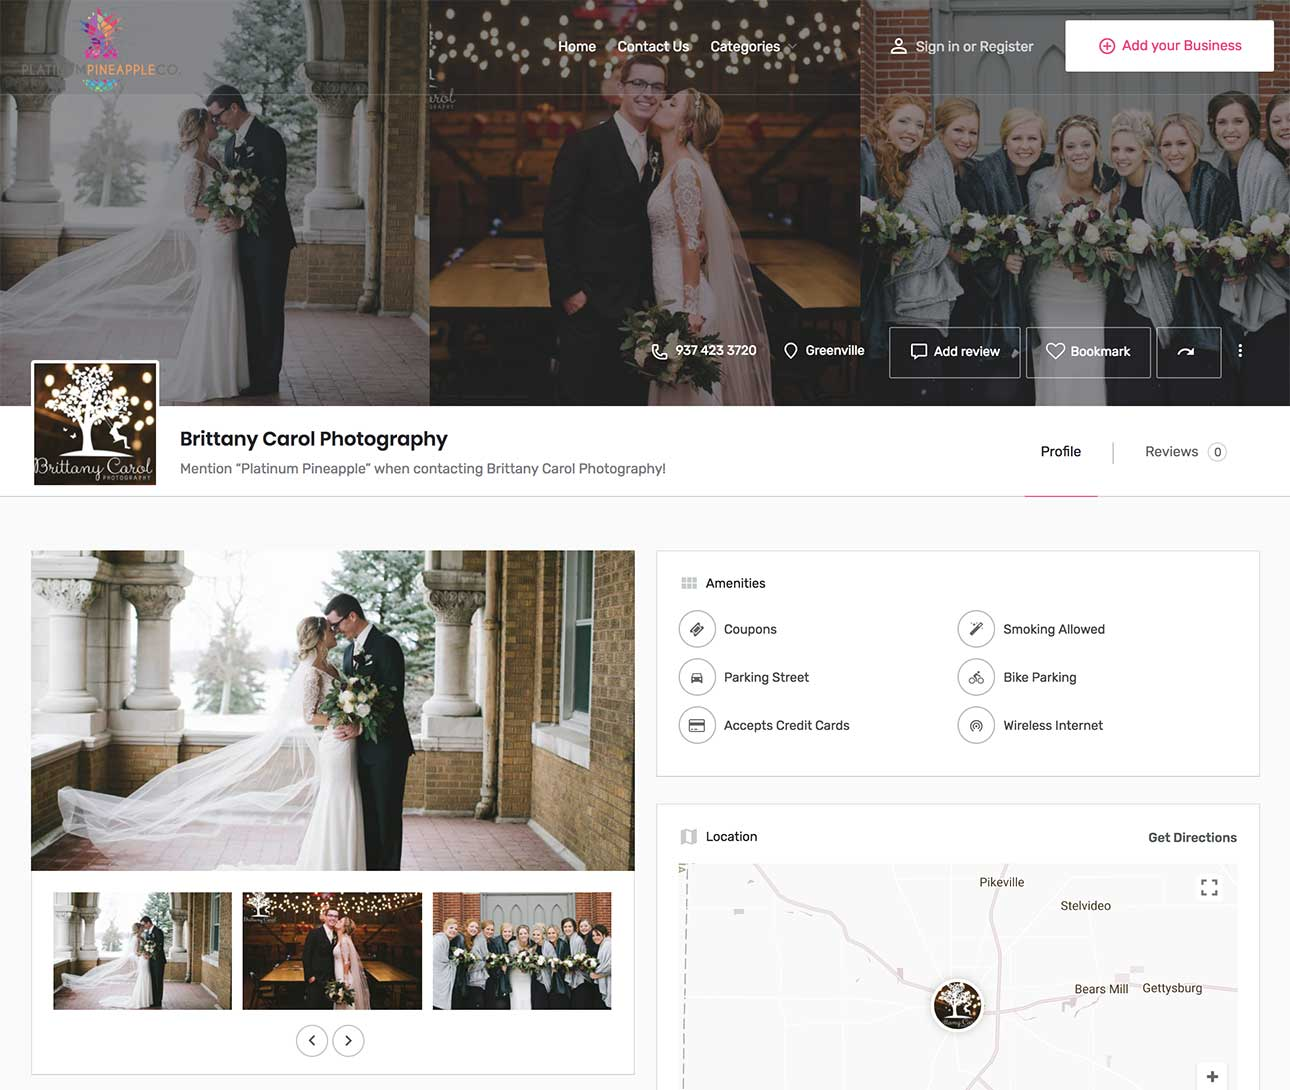 screencapture-wedsam-webgraphity-listing-brittany-carol-photography-2018-04-18-22_26_24